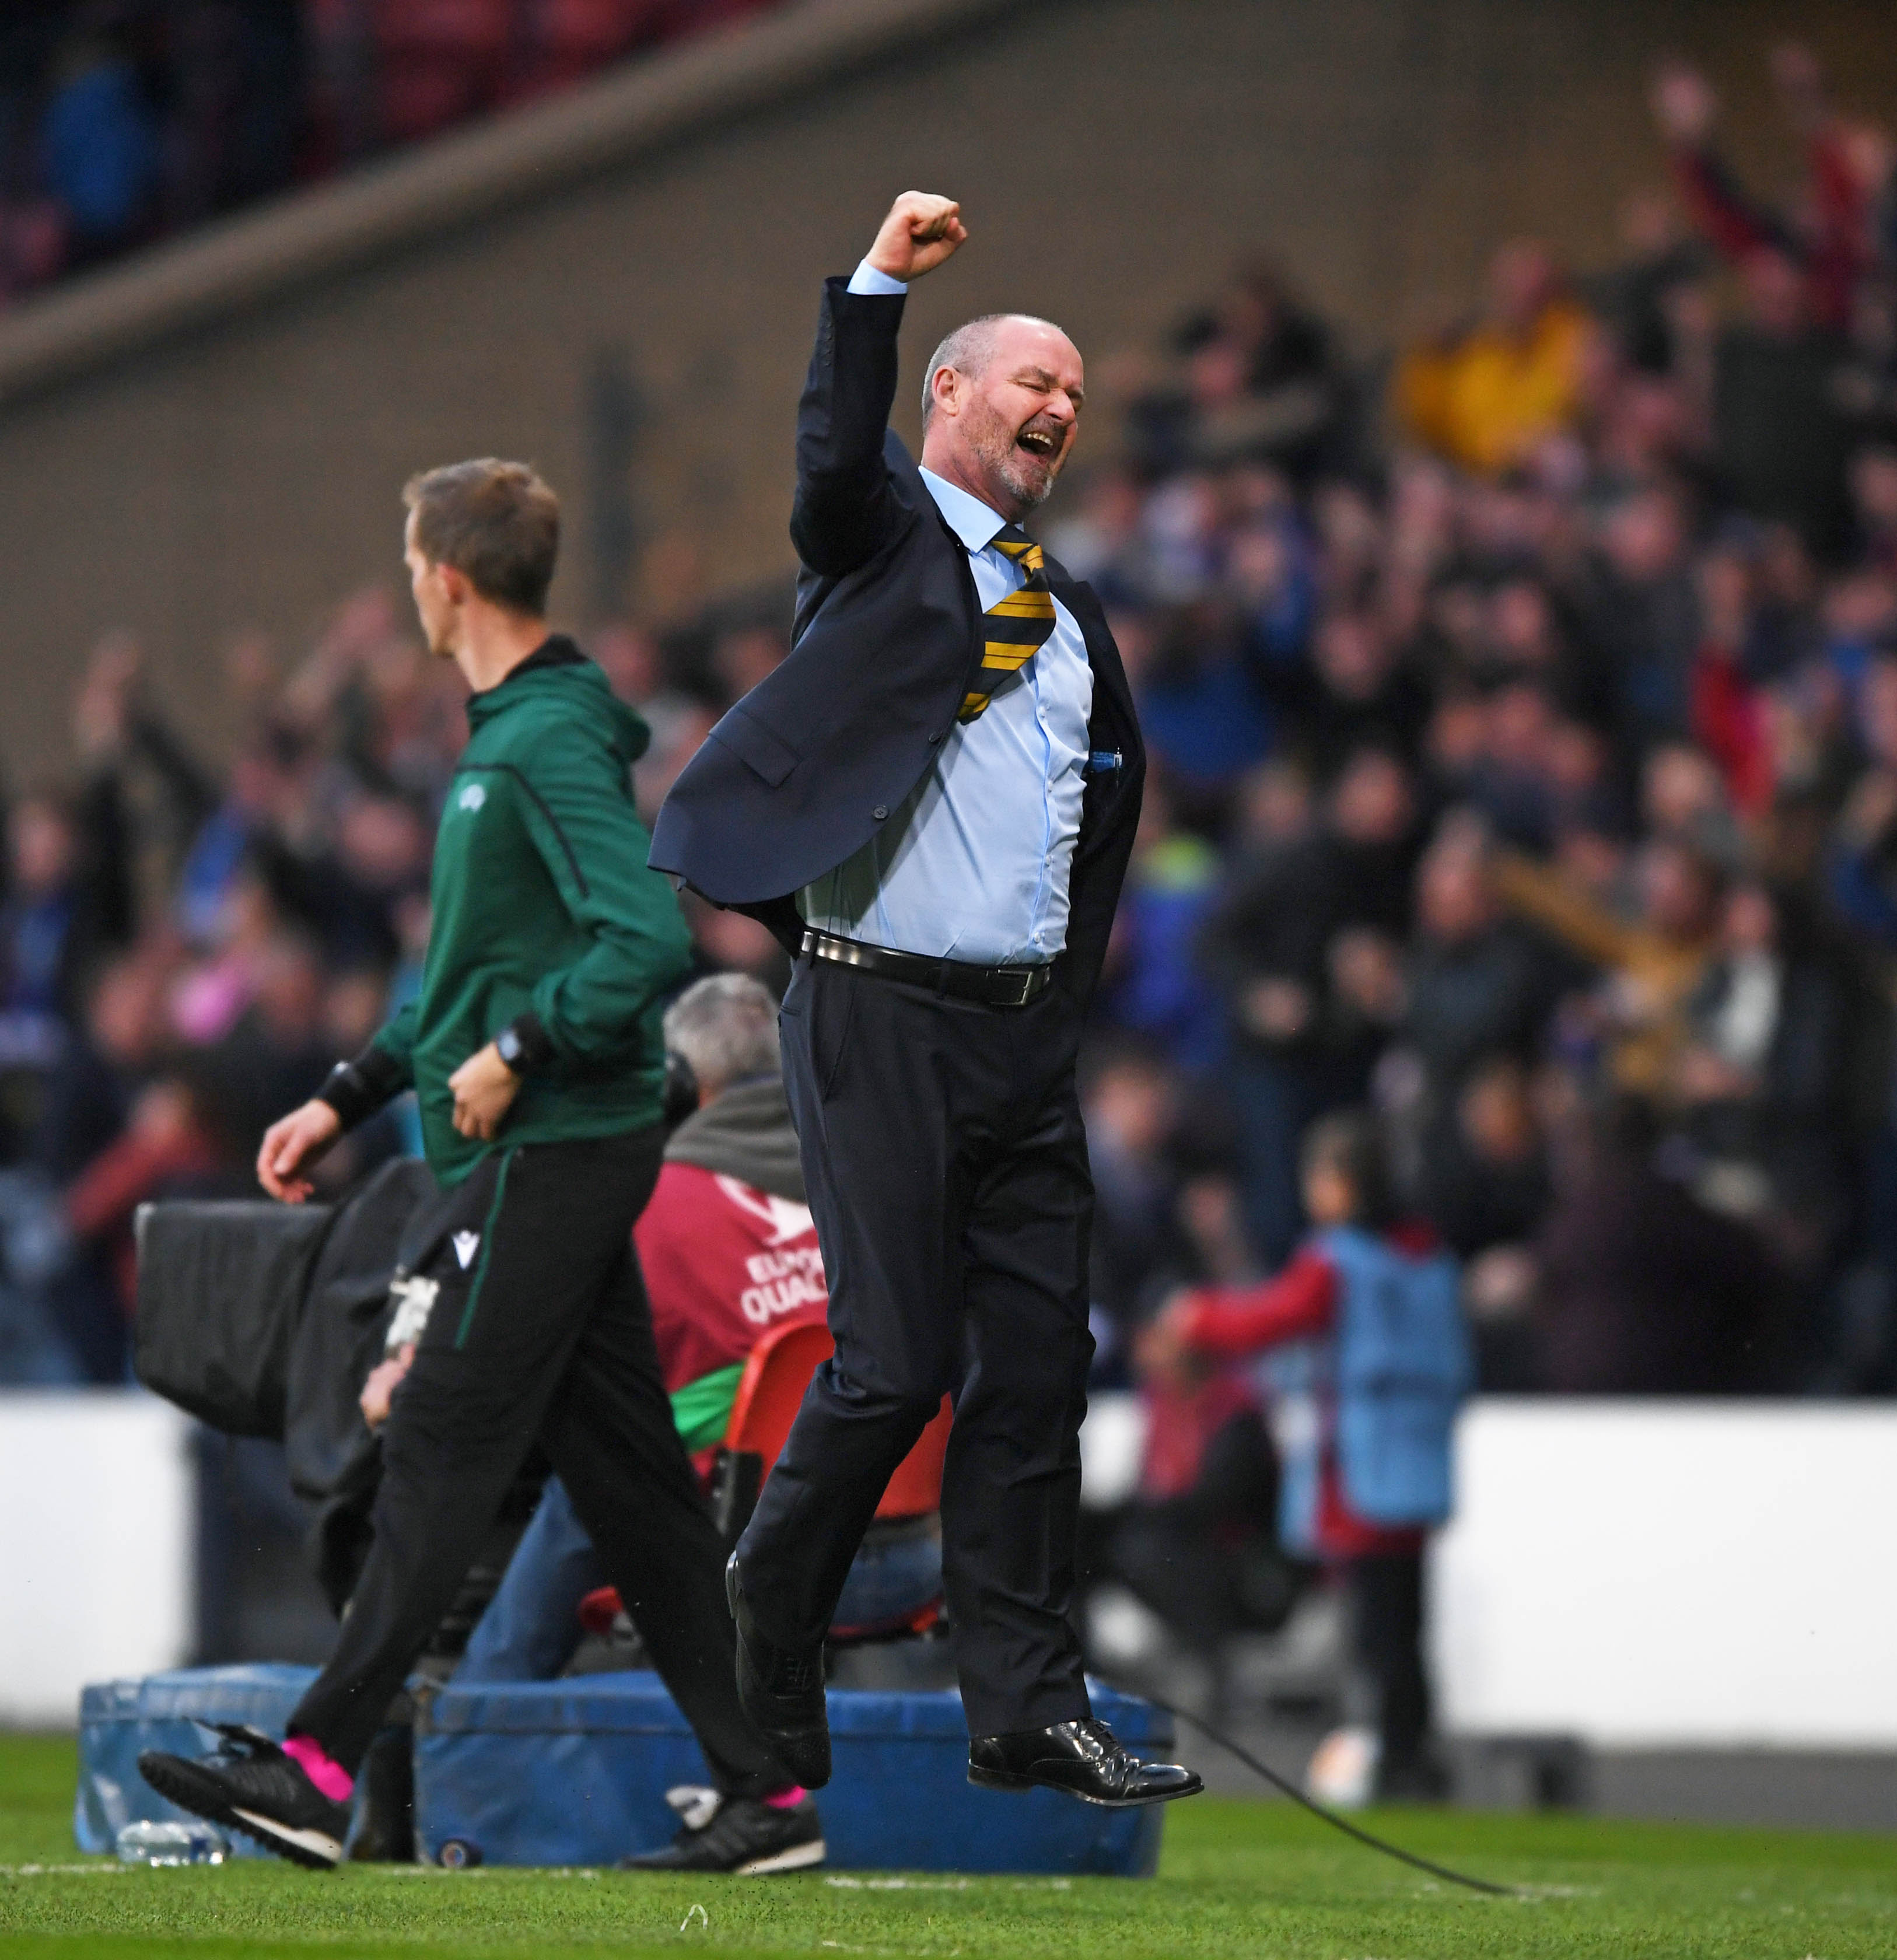 08/06/19 UEFA EUROPEAN CHAMPIONSHIP 2020 QUALIFYING ROUND SCOTLAND v CYPRUS HAMPDEN PARK - GLASGOW Scotland manager Steve Clarke celebrates Oliver Burke's late goal